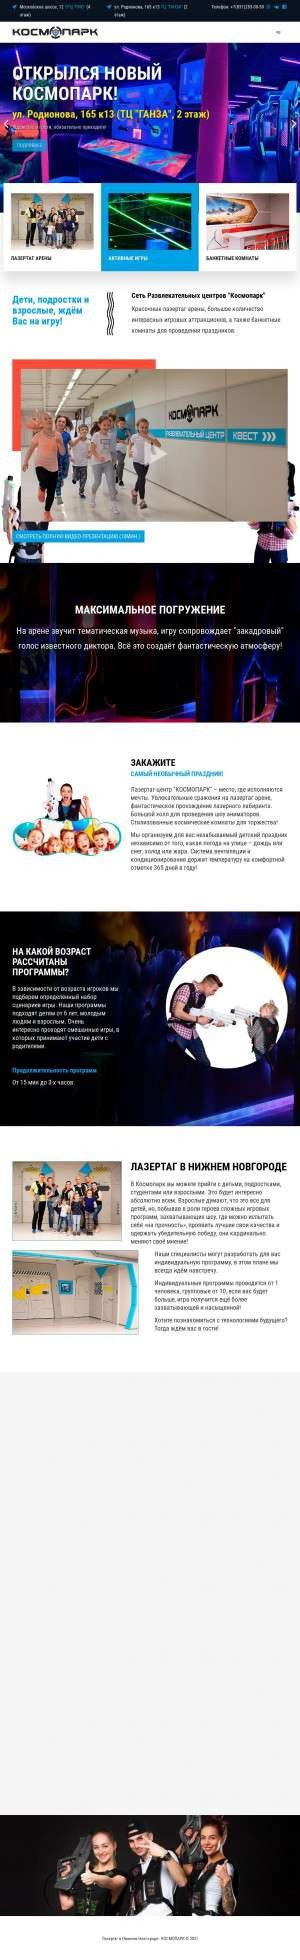 Предпросмотр для cosmopark-nn.ru — Космопарк